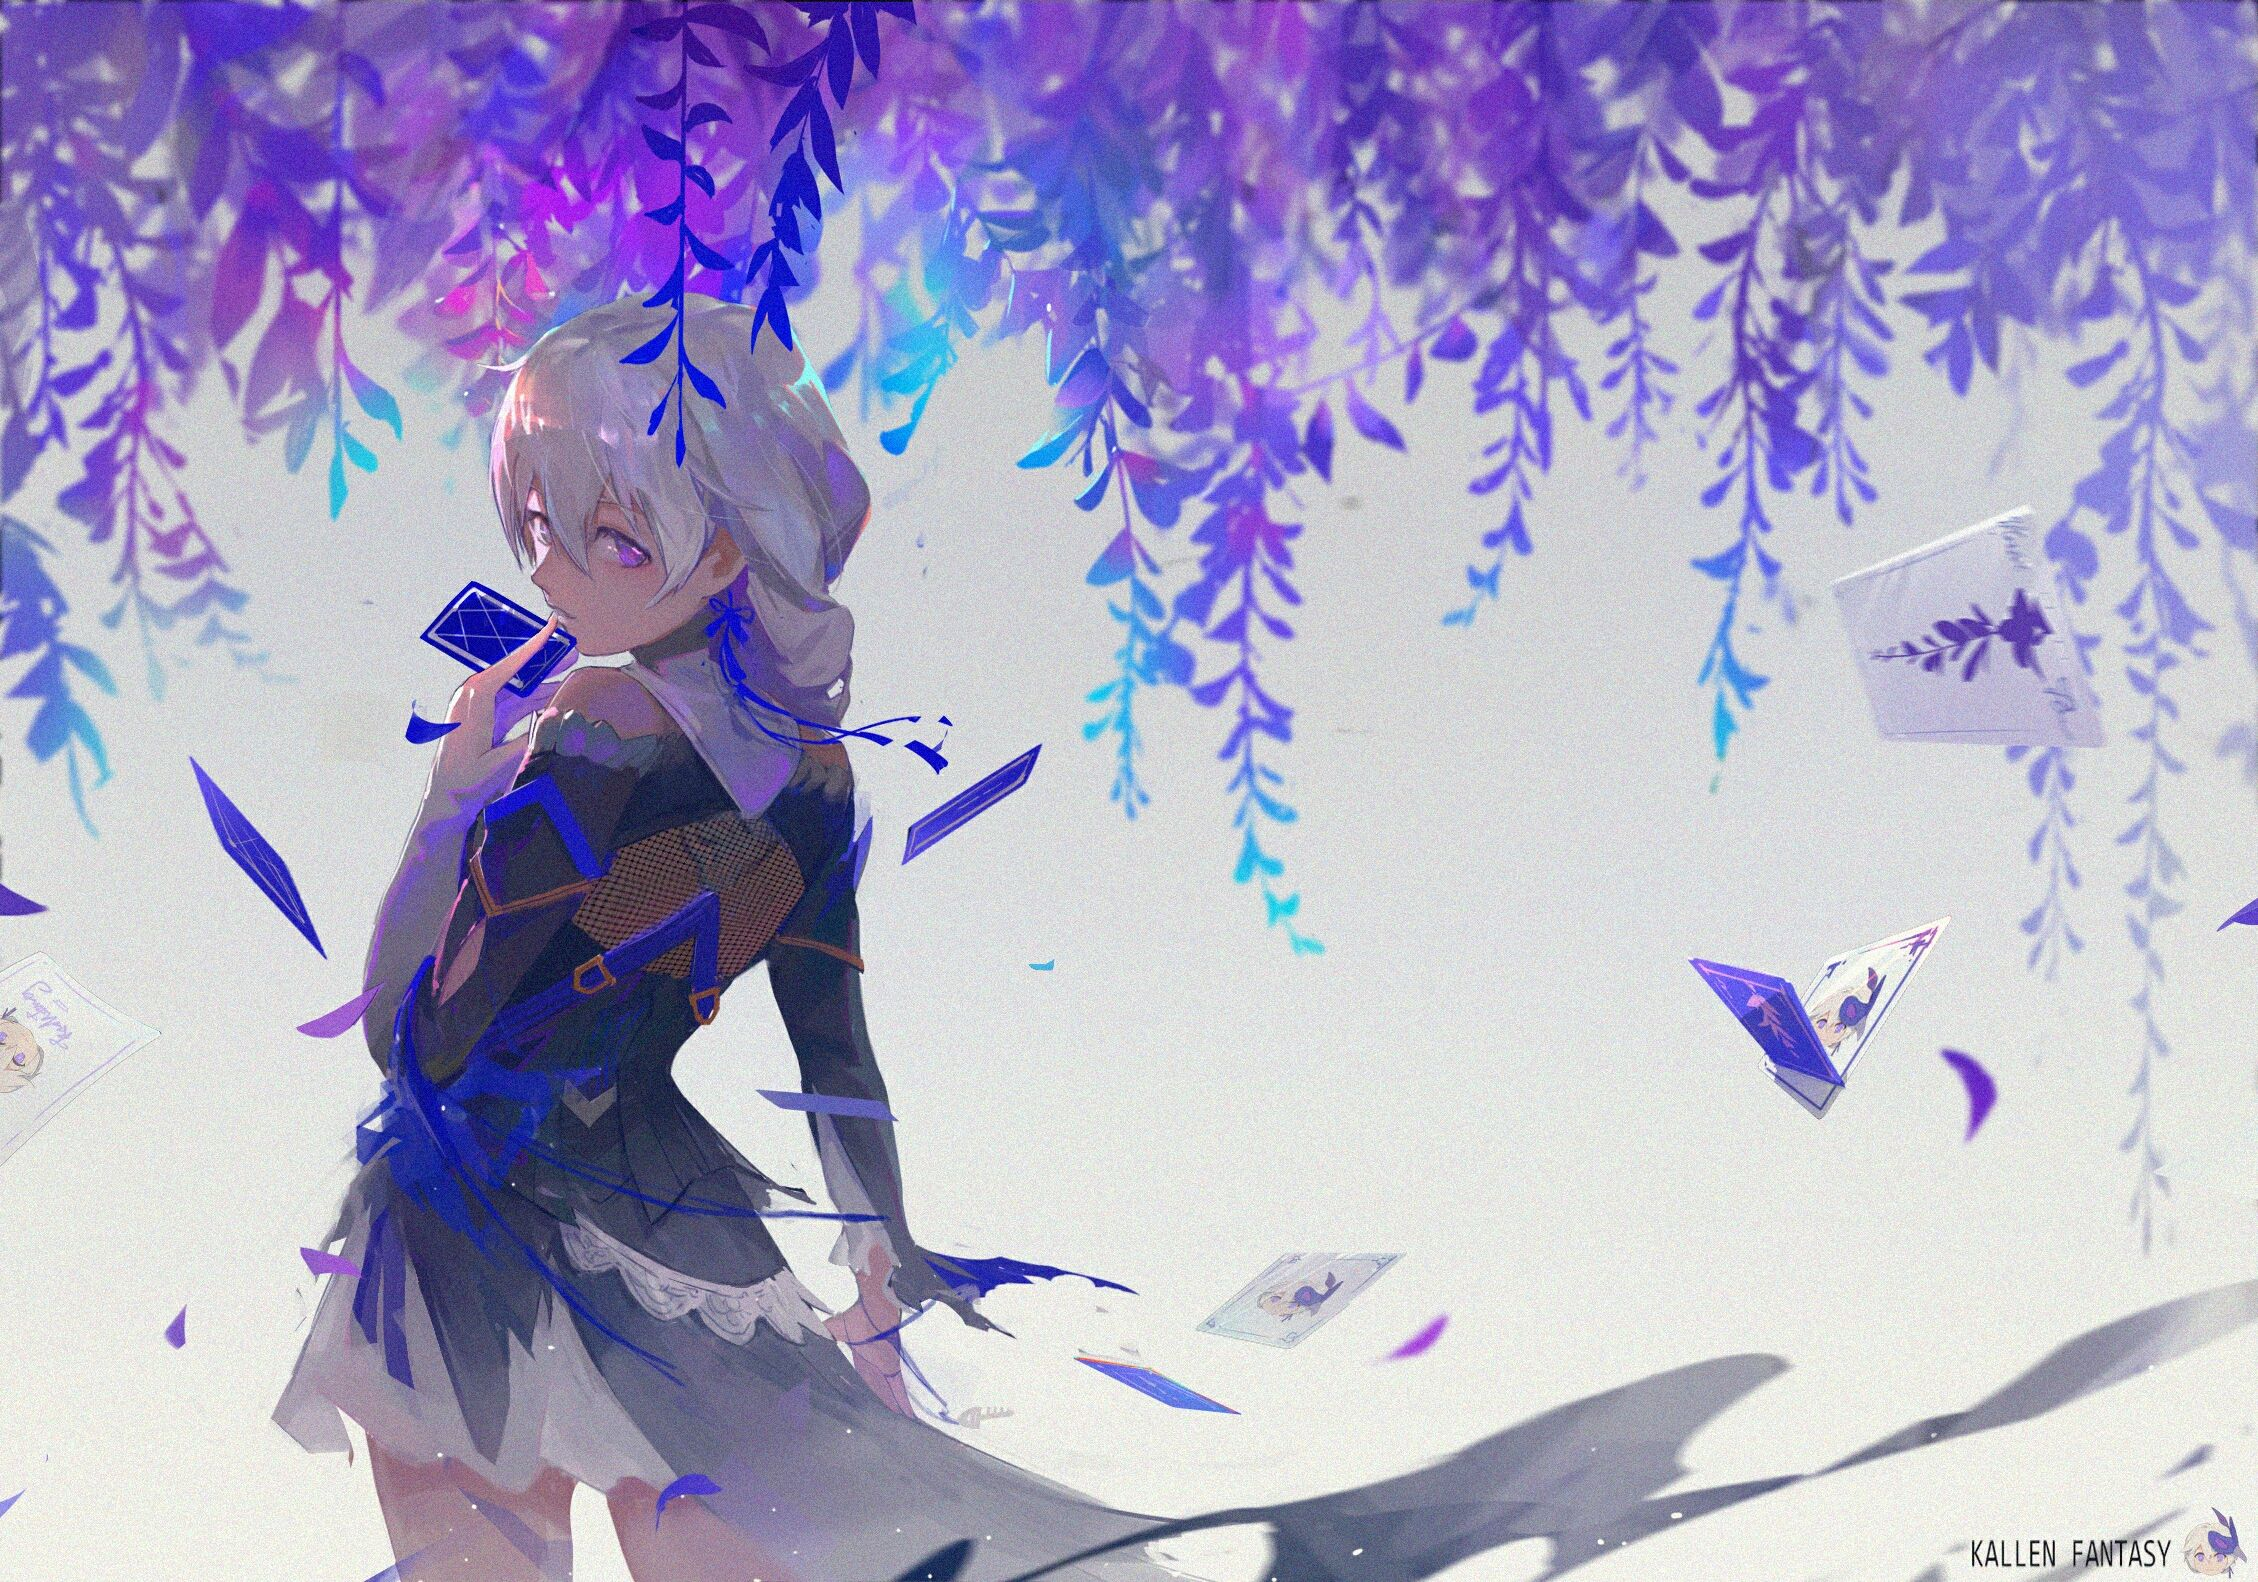 Pin By Otaku Depre On Honkai Impact Anime Anime Art Beautiful Anime Images